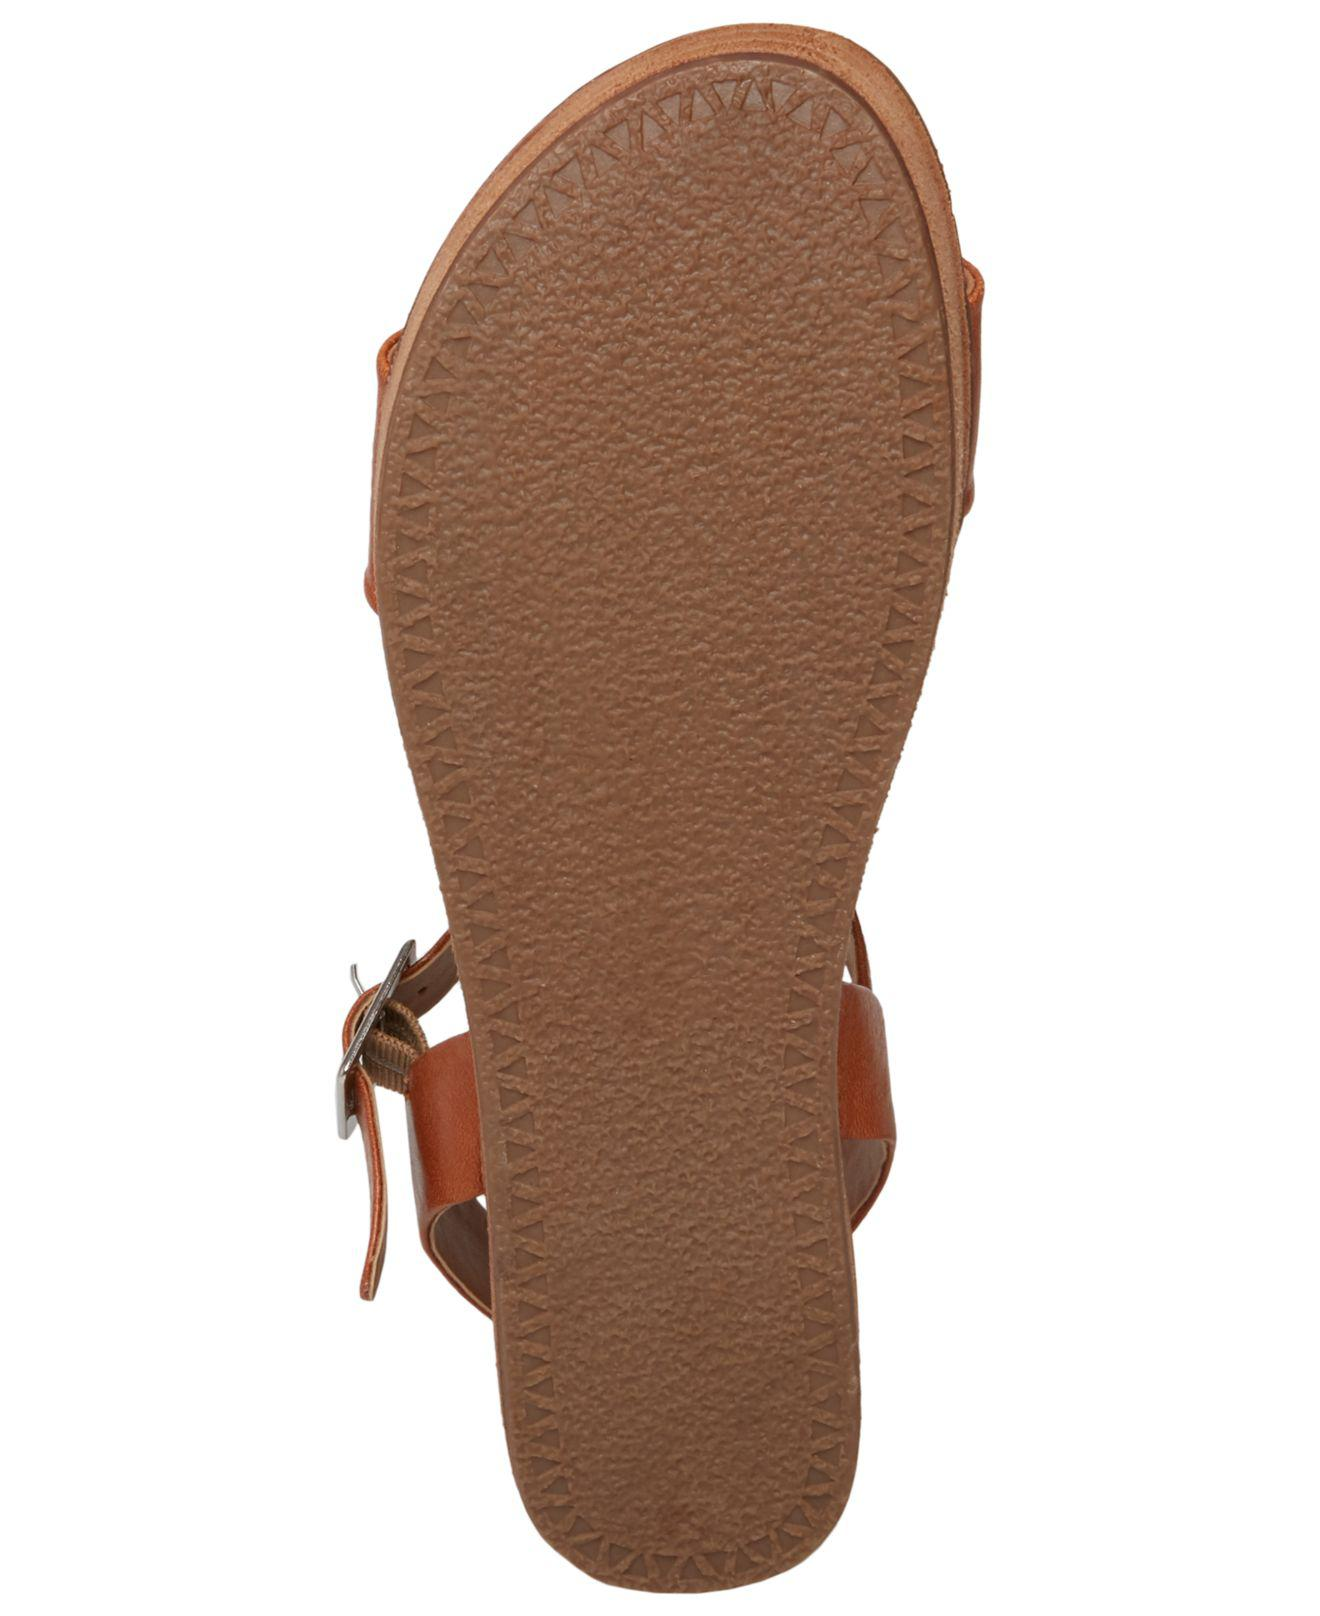 5c4b92c651f7 Lyst - Steve Madden Aida Flatform Sandals in Brown